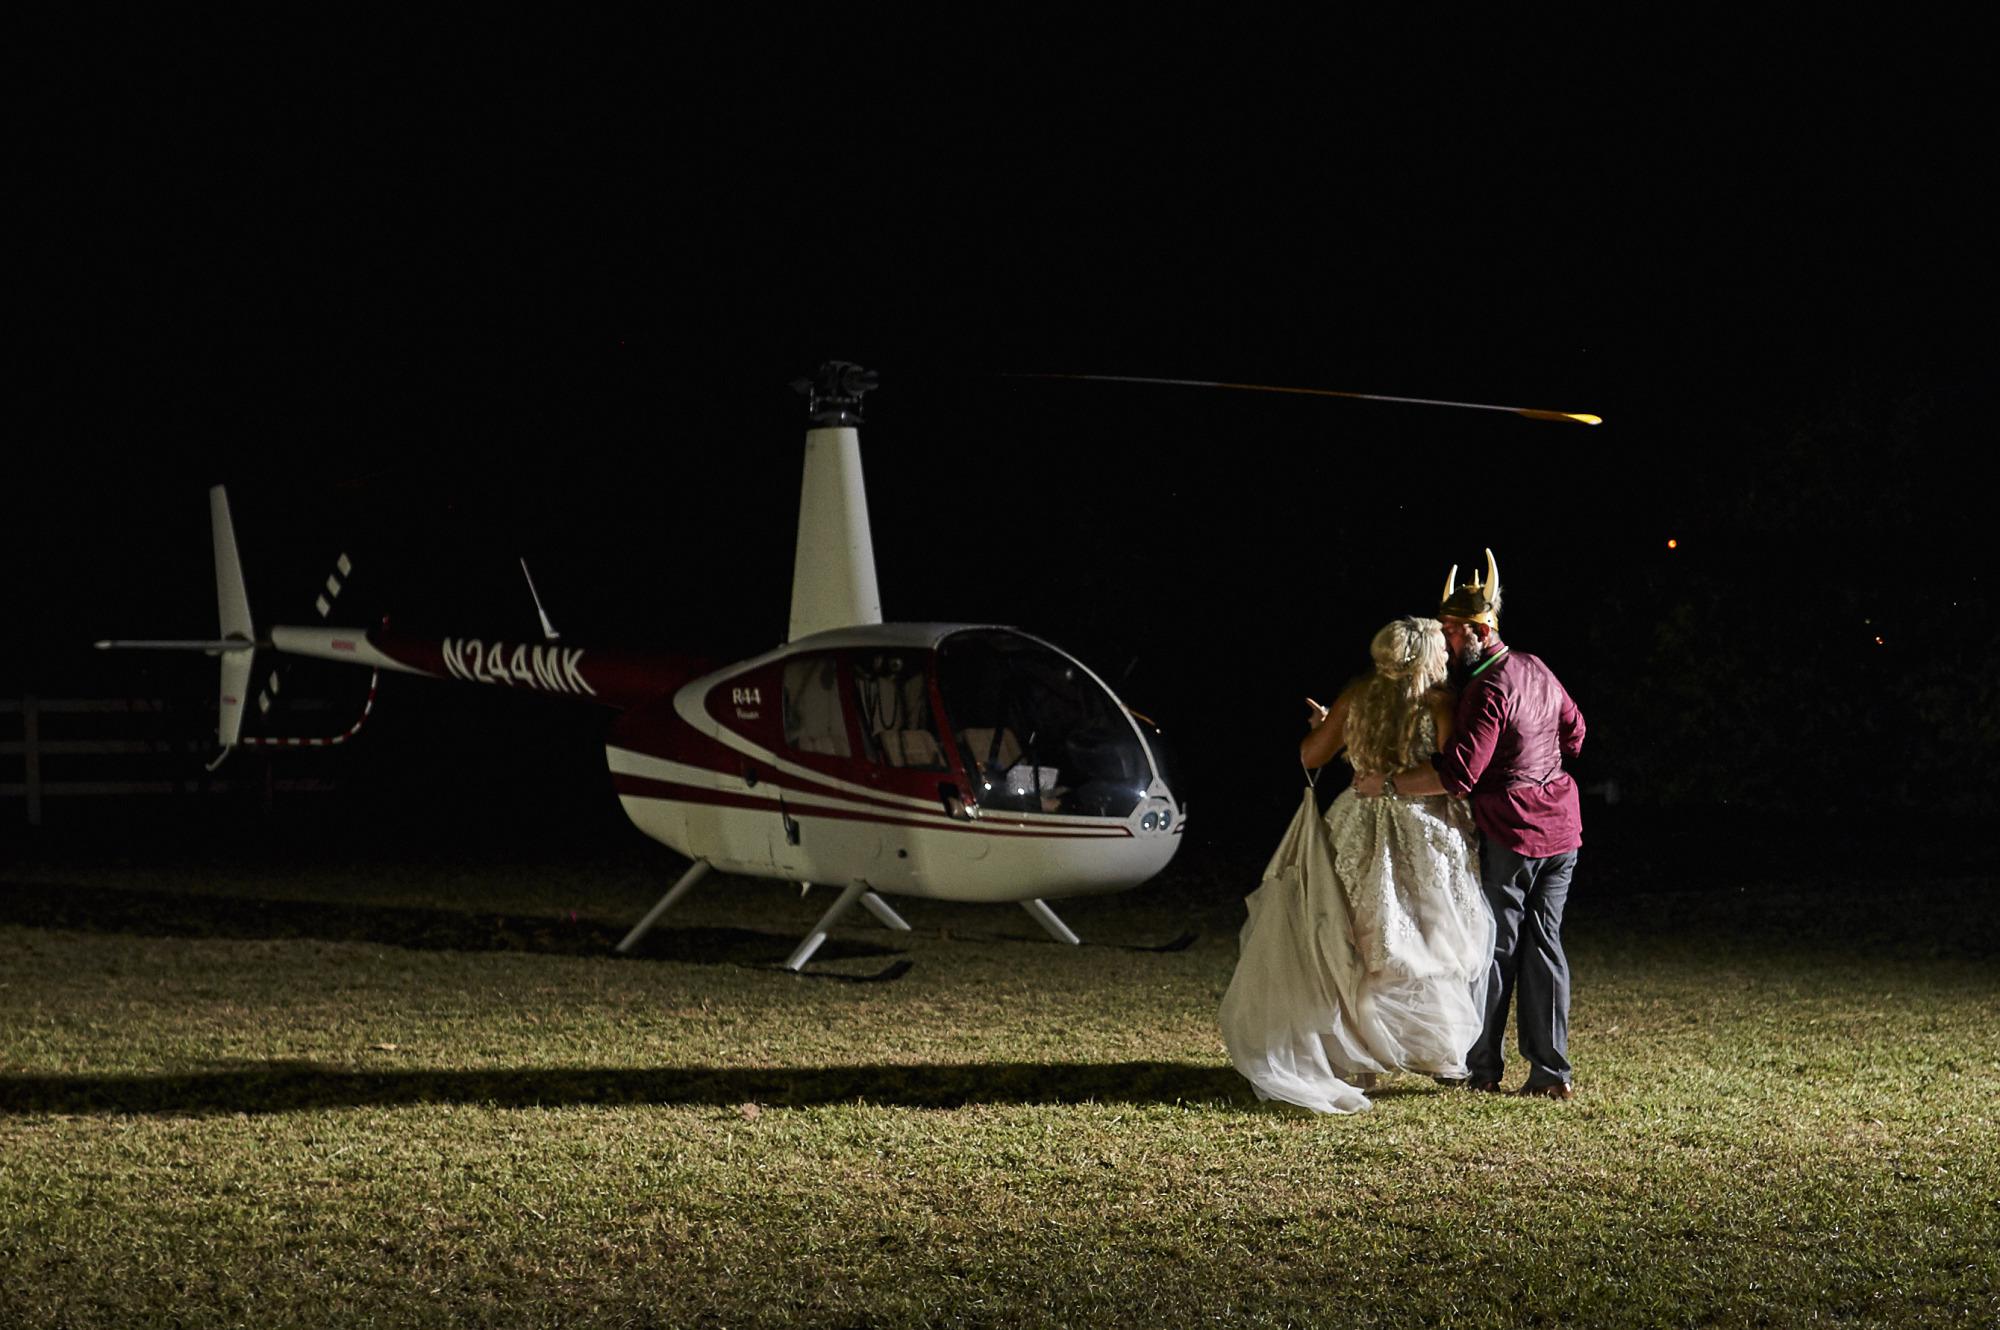 Taylor and Cody - Taylor Mansion and Crystal Ball Room - Taylor Texas - Wedding - 045